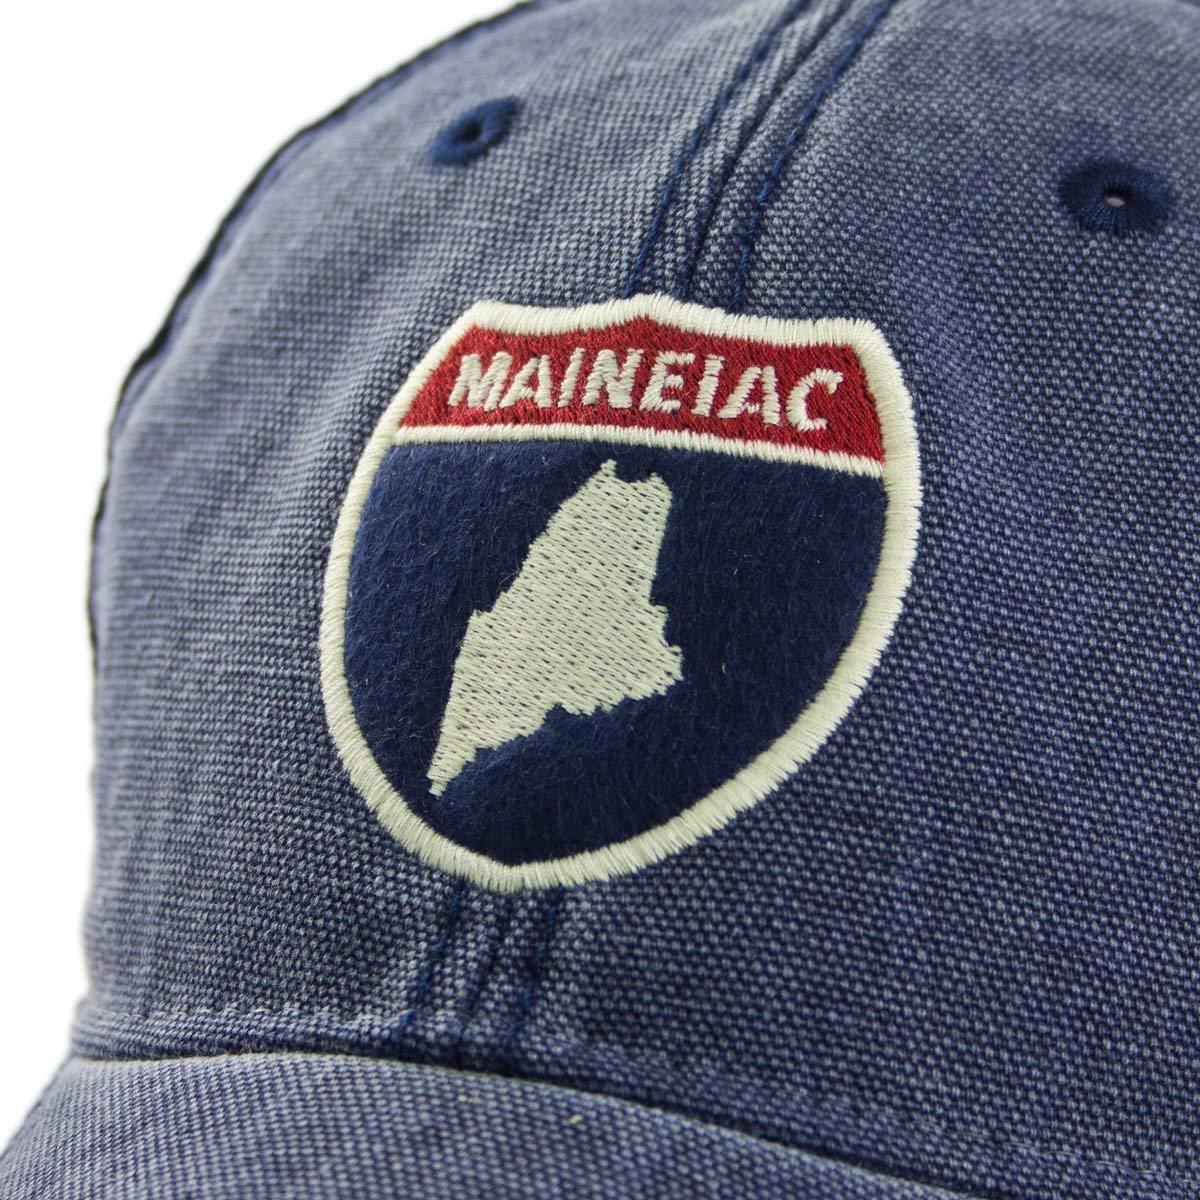 94a5f6dc13c51 Chowdaheadz Maine Road Sign Cobblestone Trucker at Amazon Men s Clothing  store